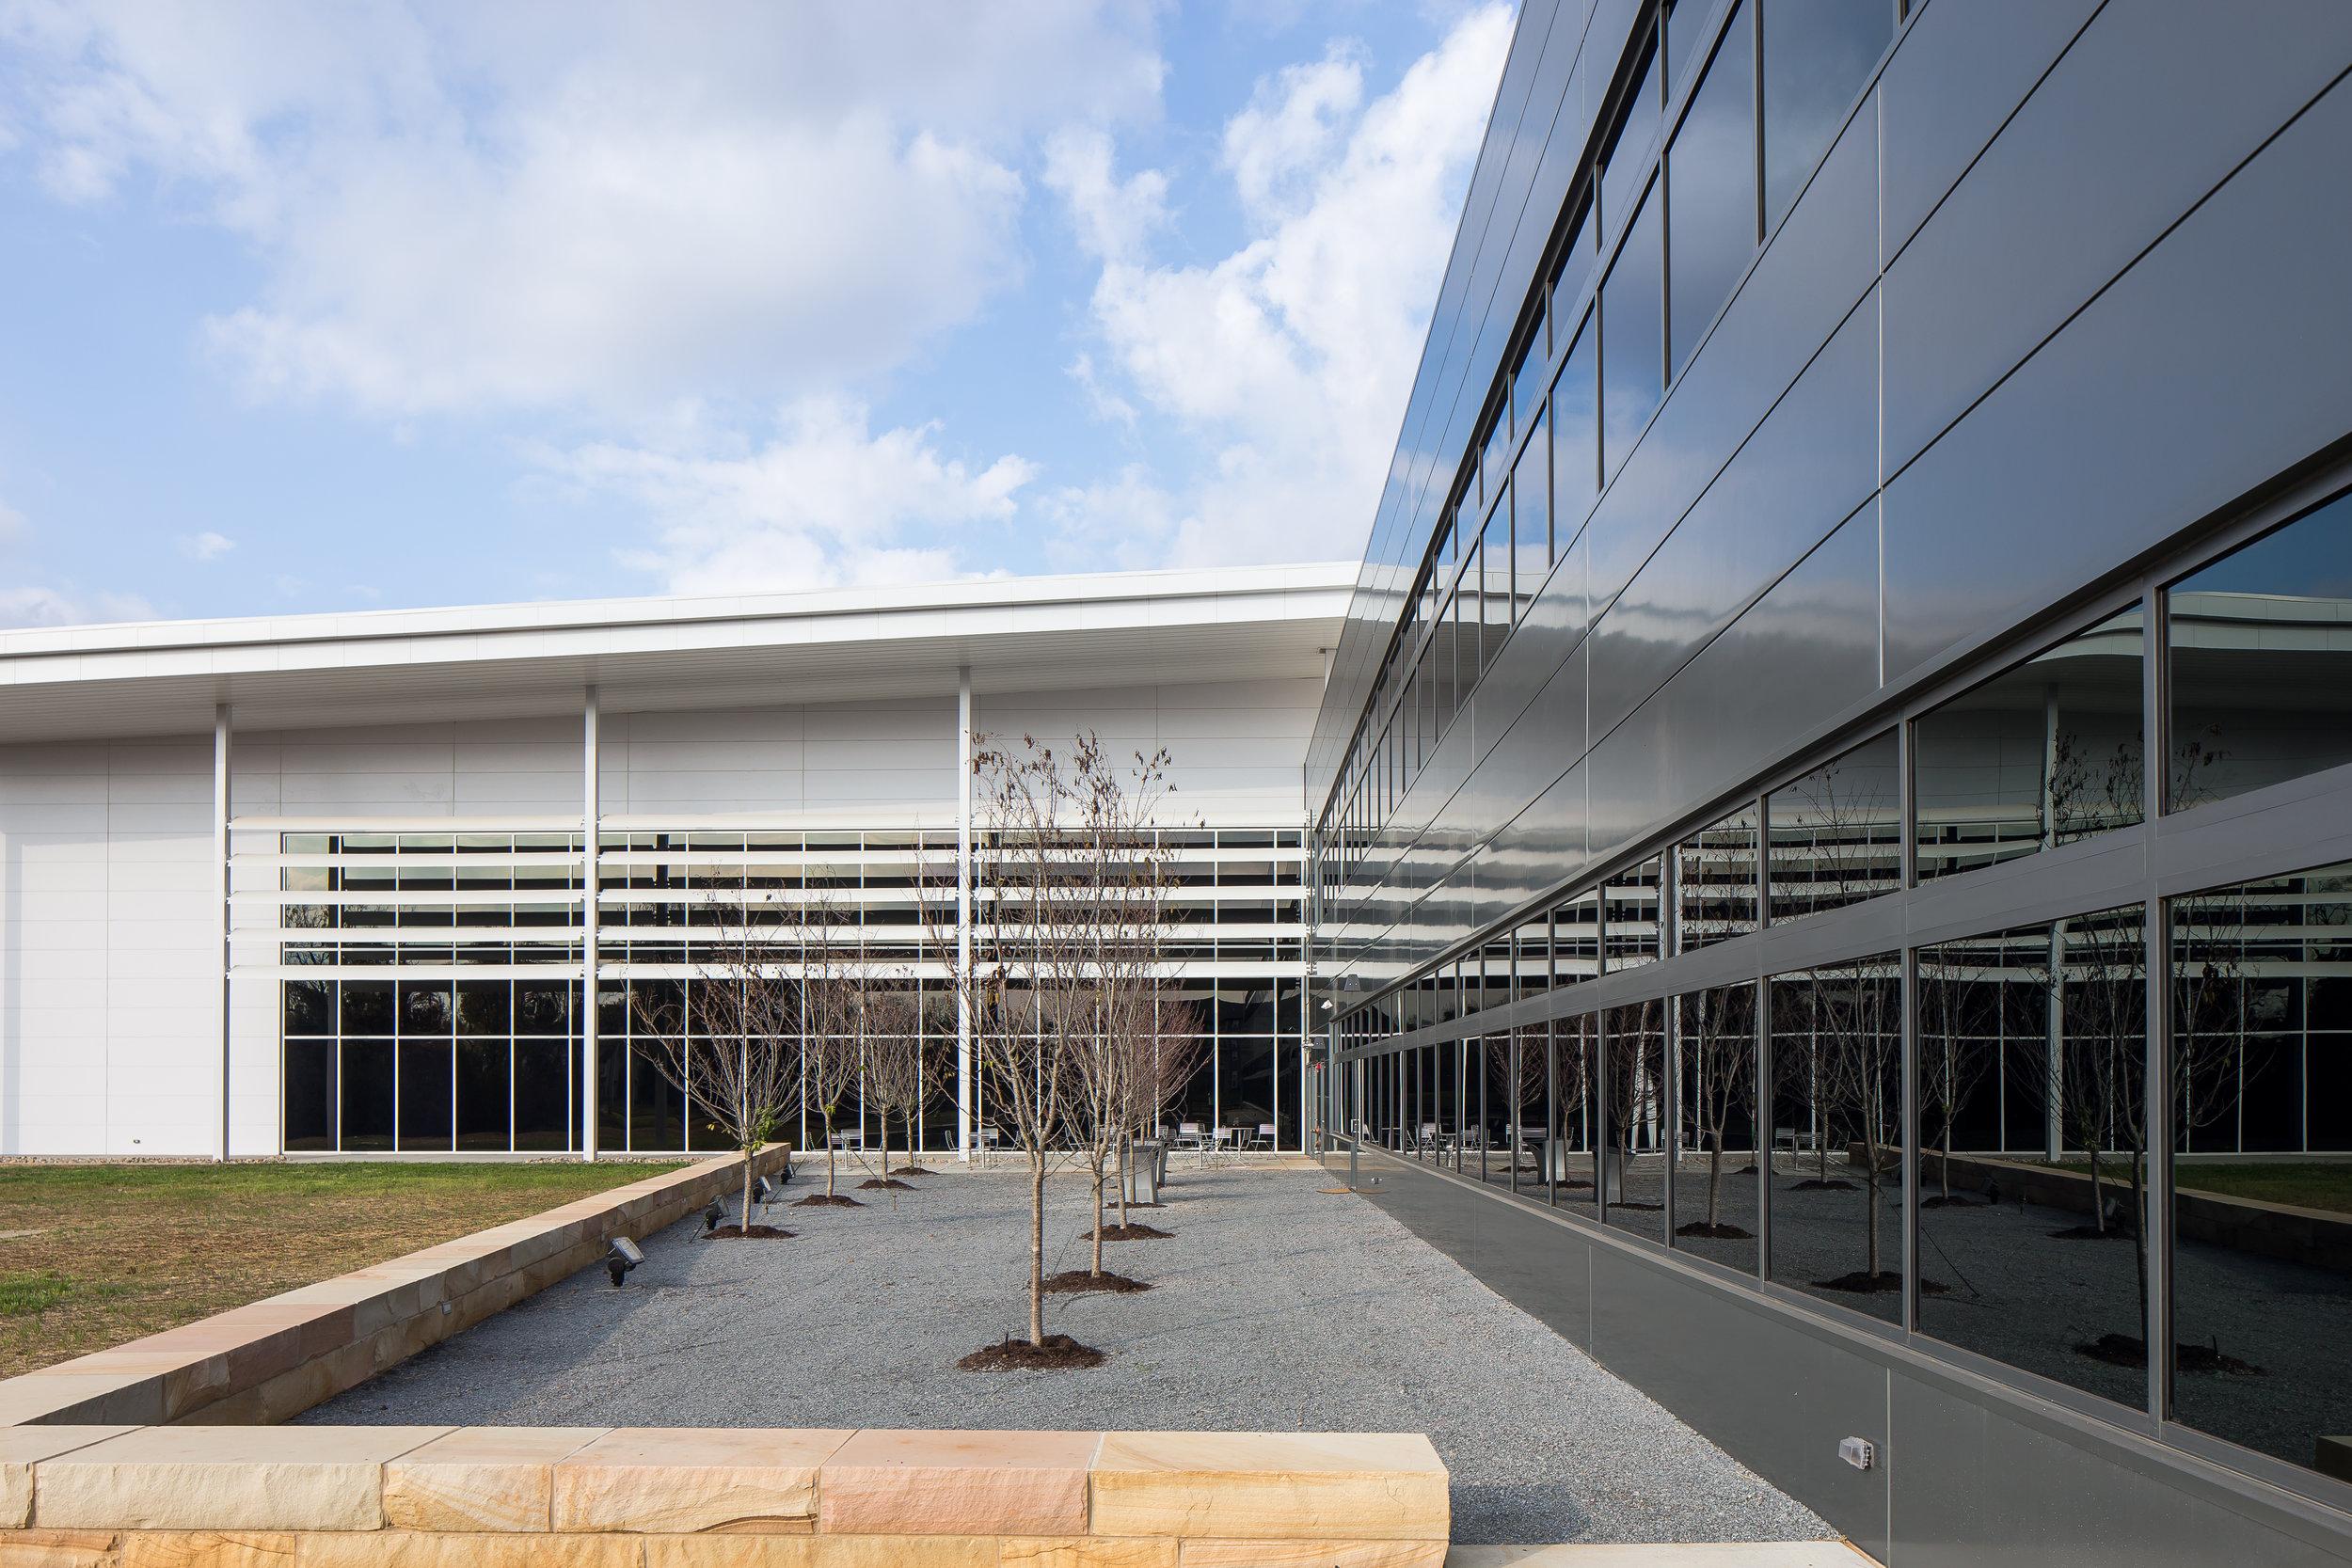 TCAT/Nissan Training Center - 05